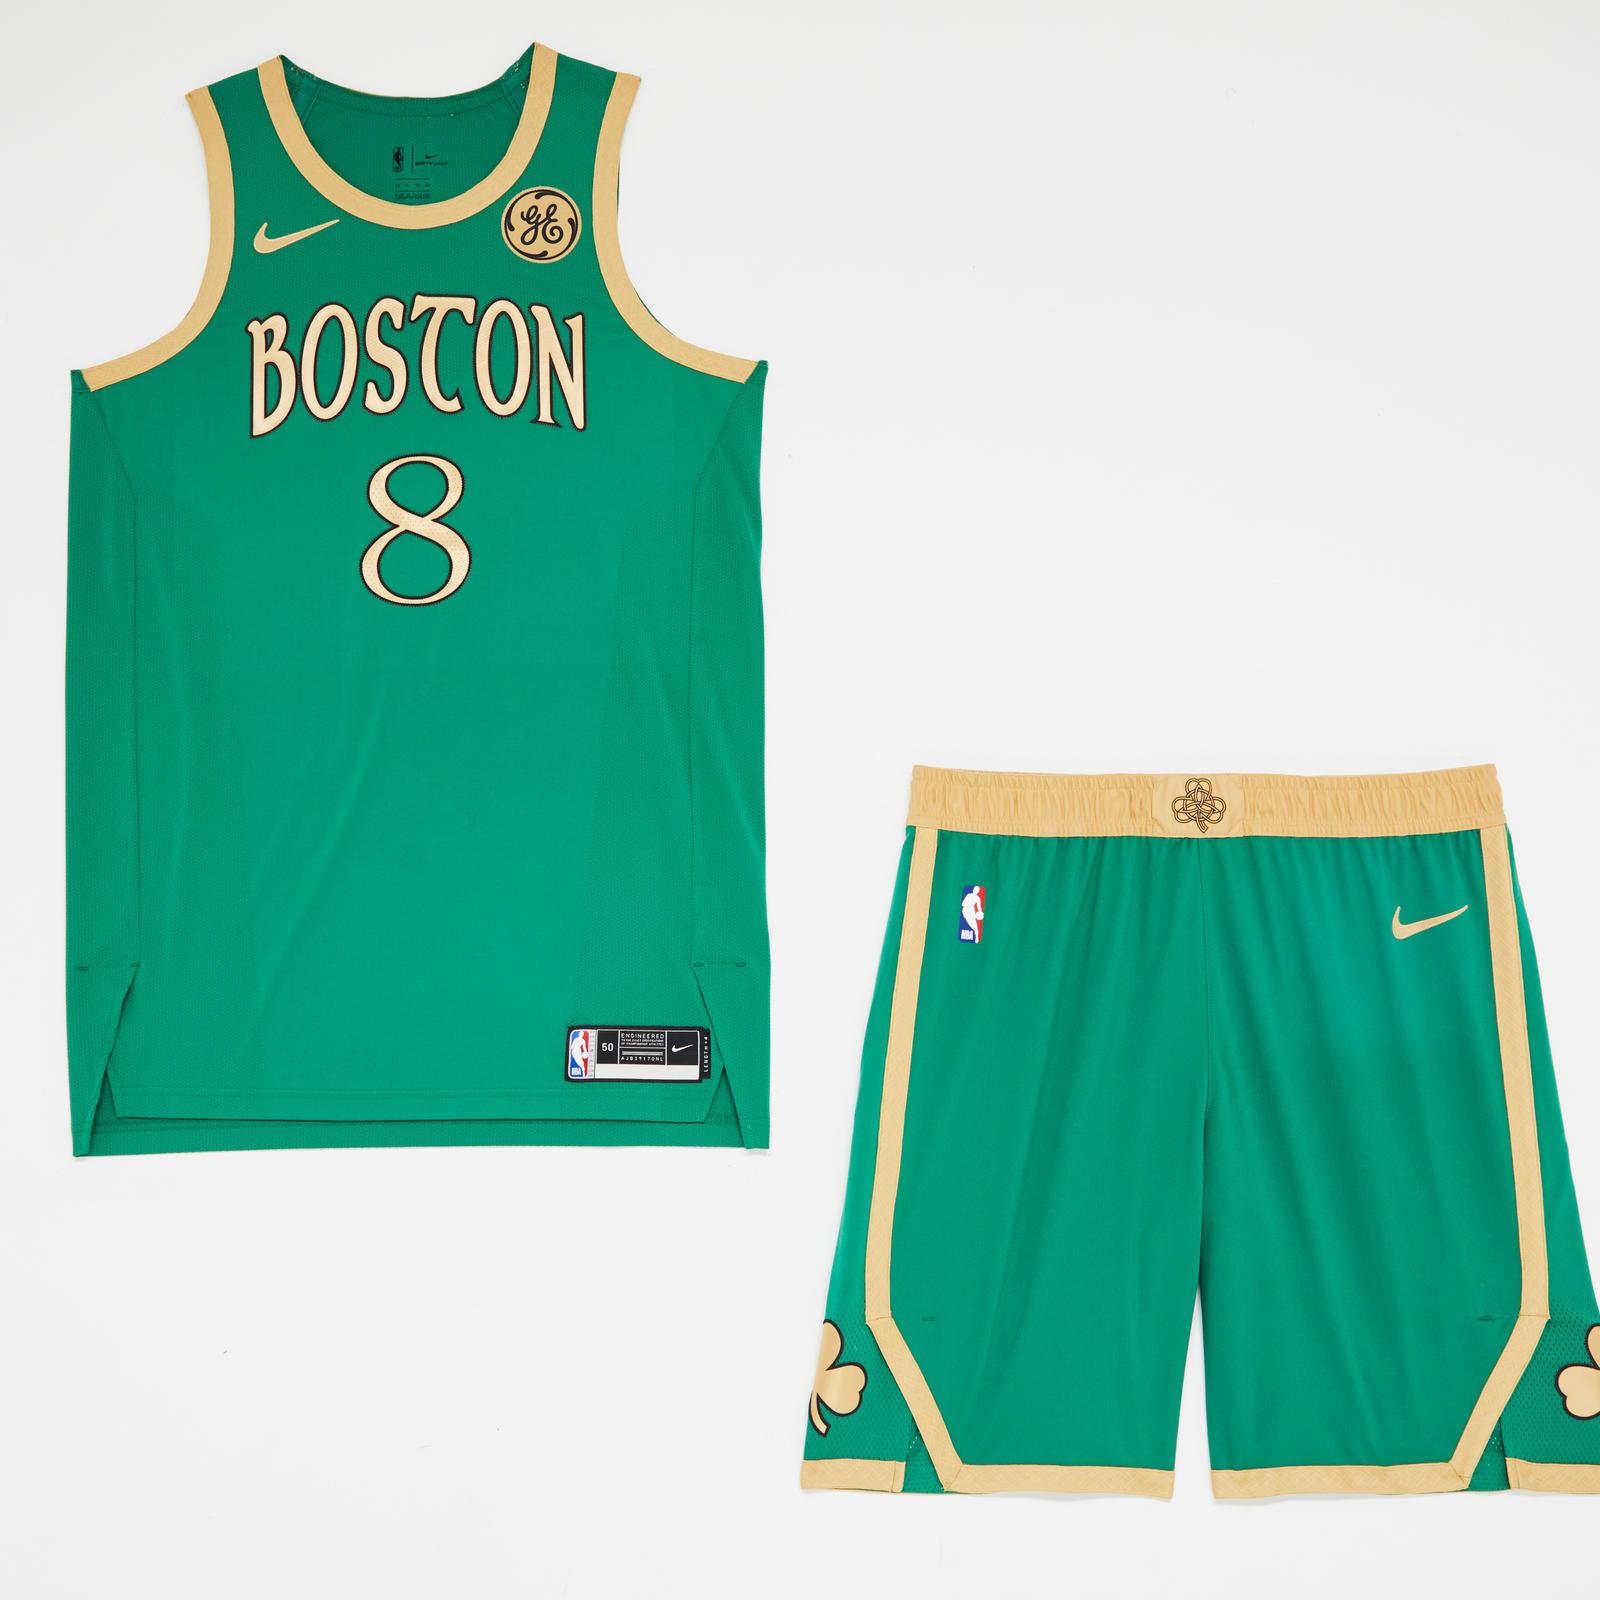 Nike NBA City Edition Uniforms 2019-20